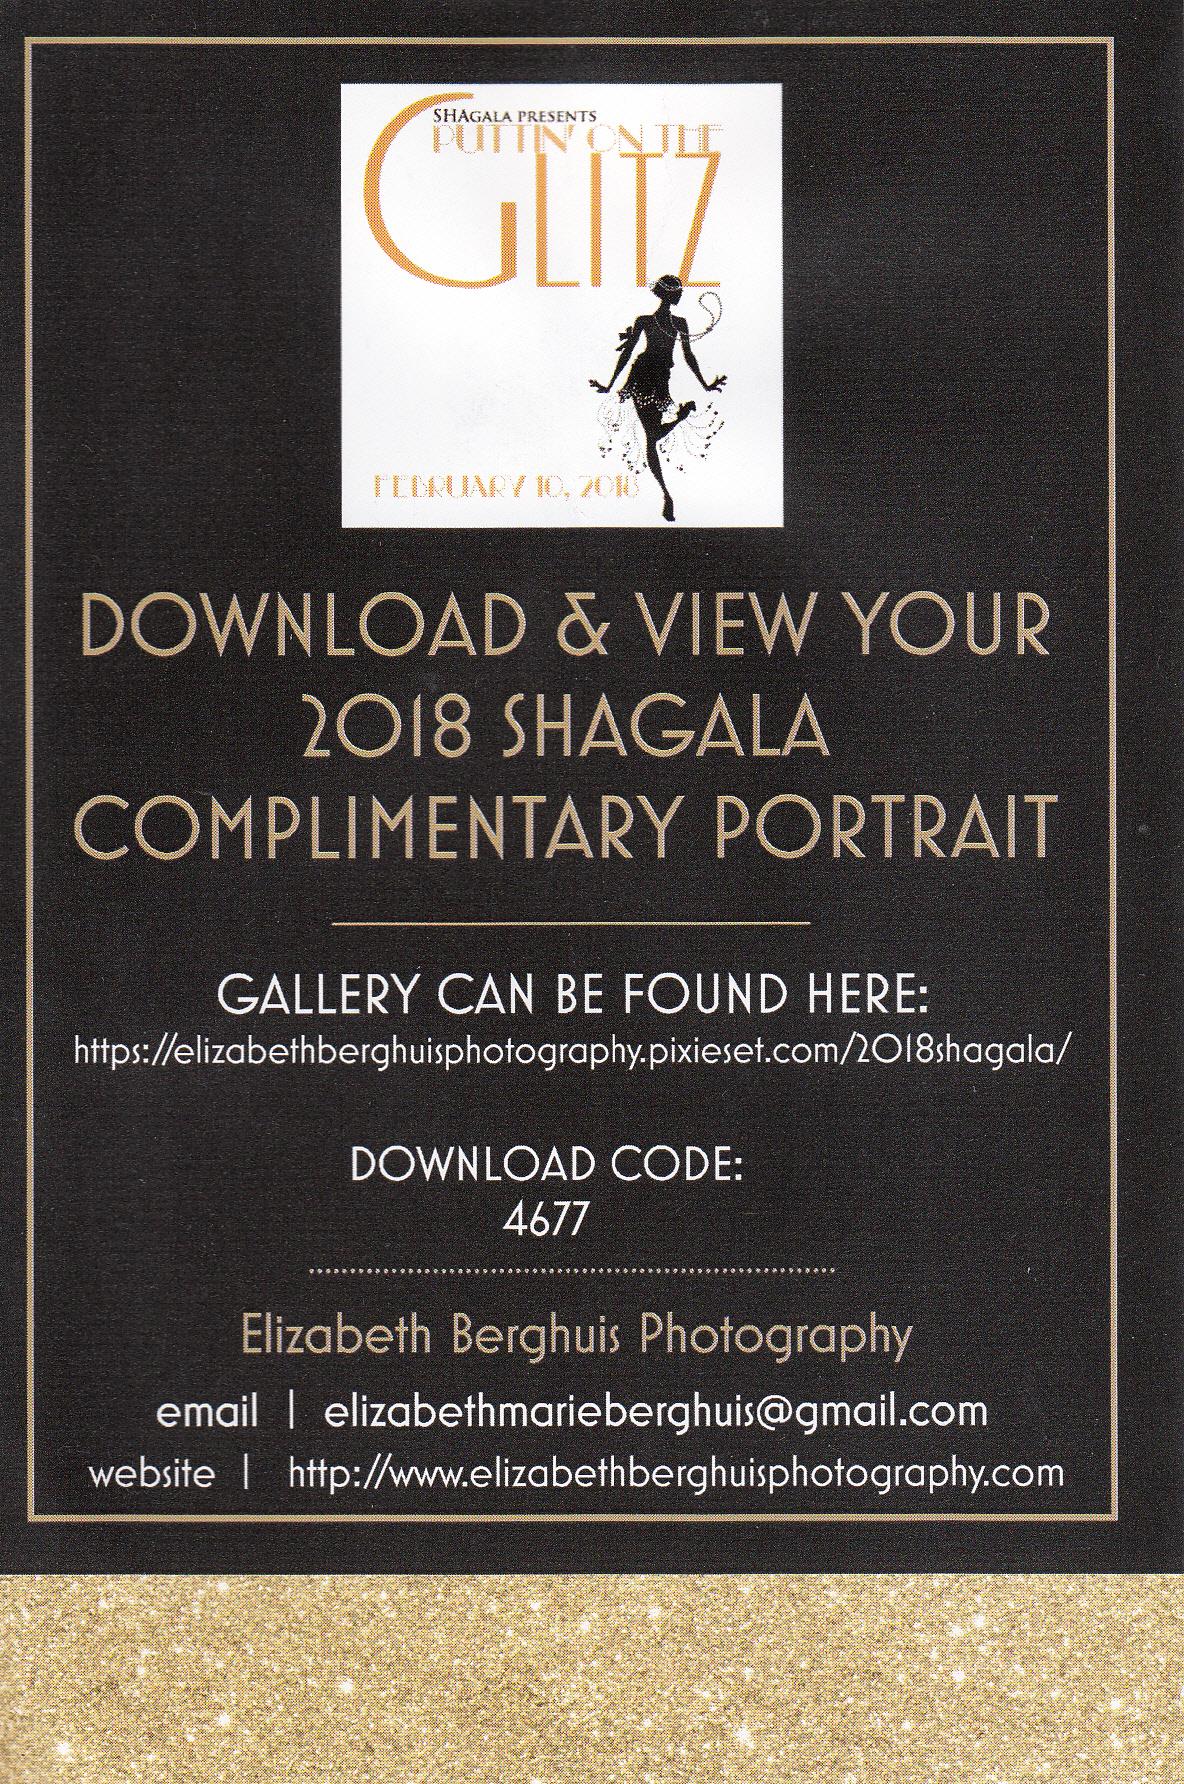 https://elizabethberghuisphotography.pixieset.com/guestlogin/2018shagala/?return=/2018shagala/